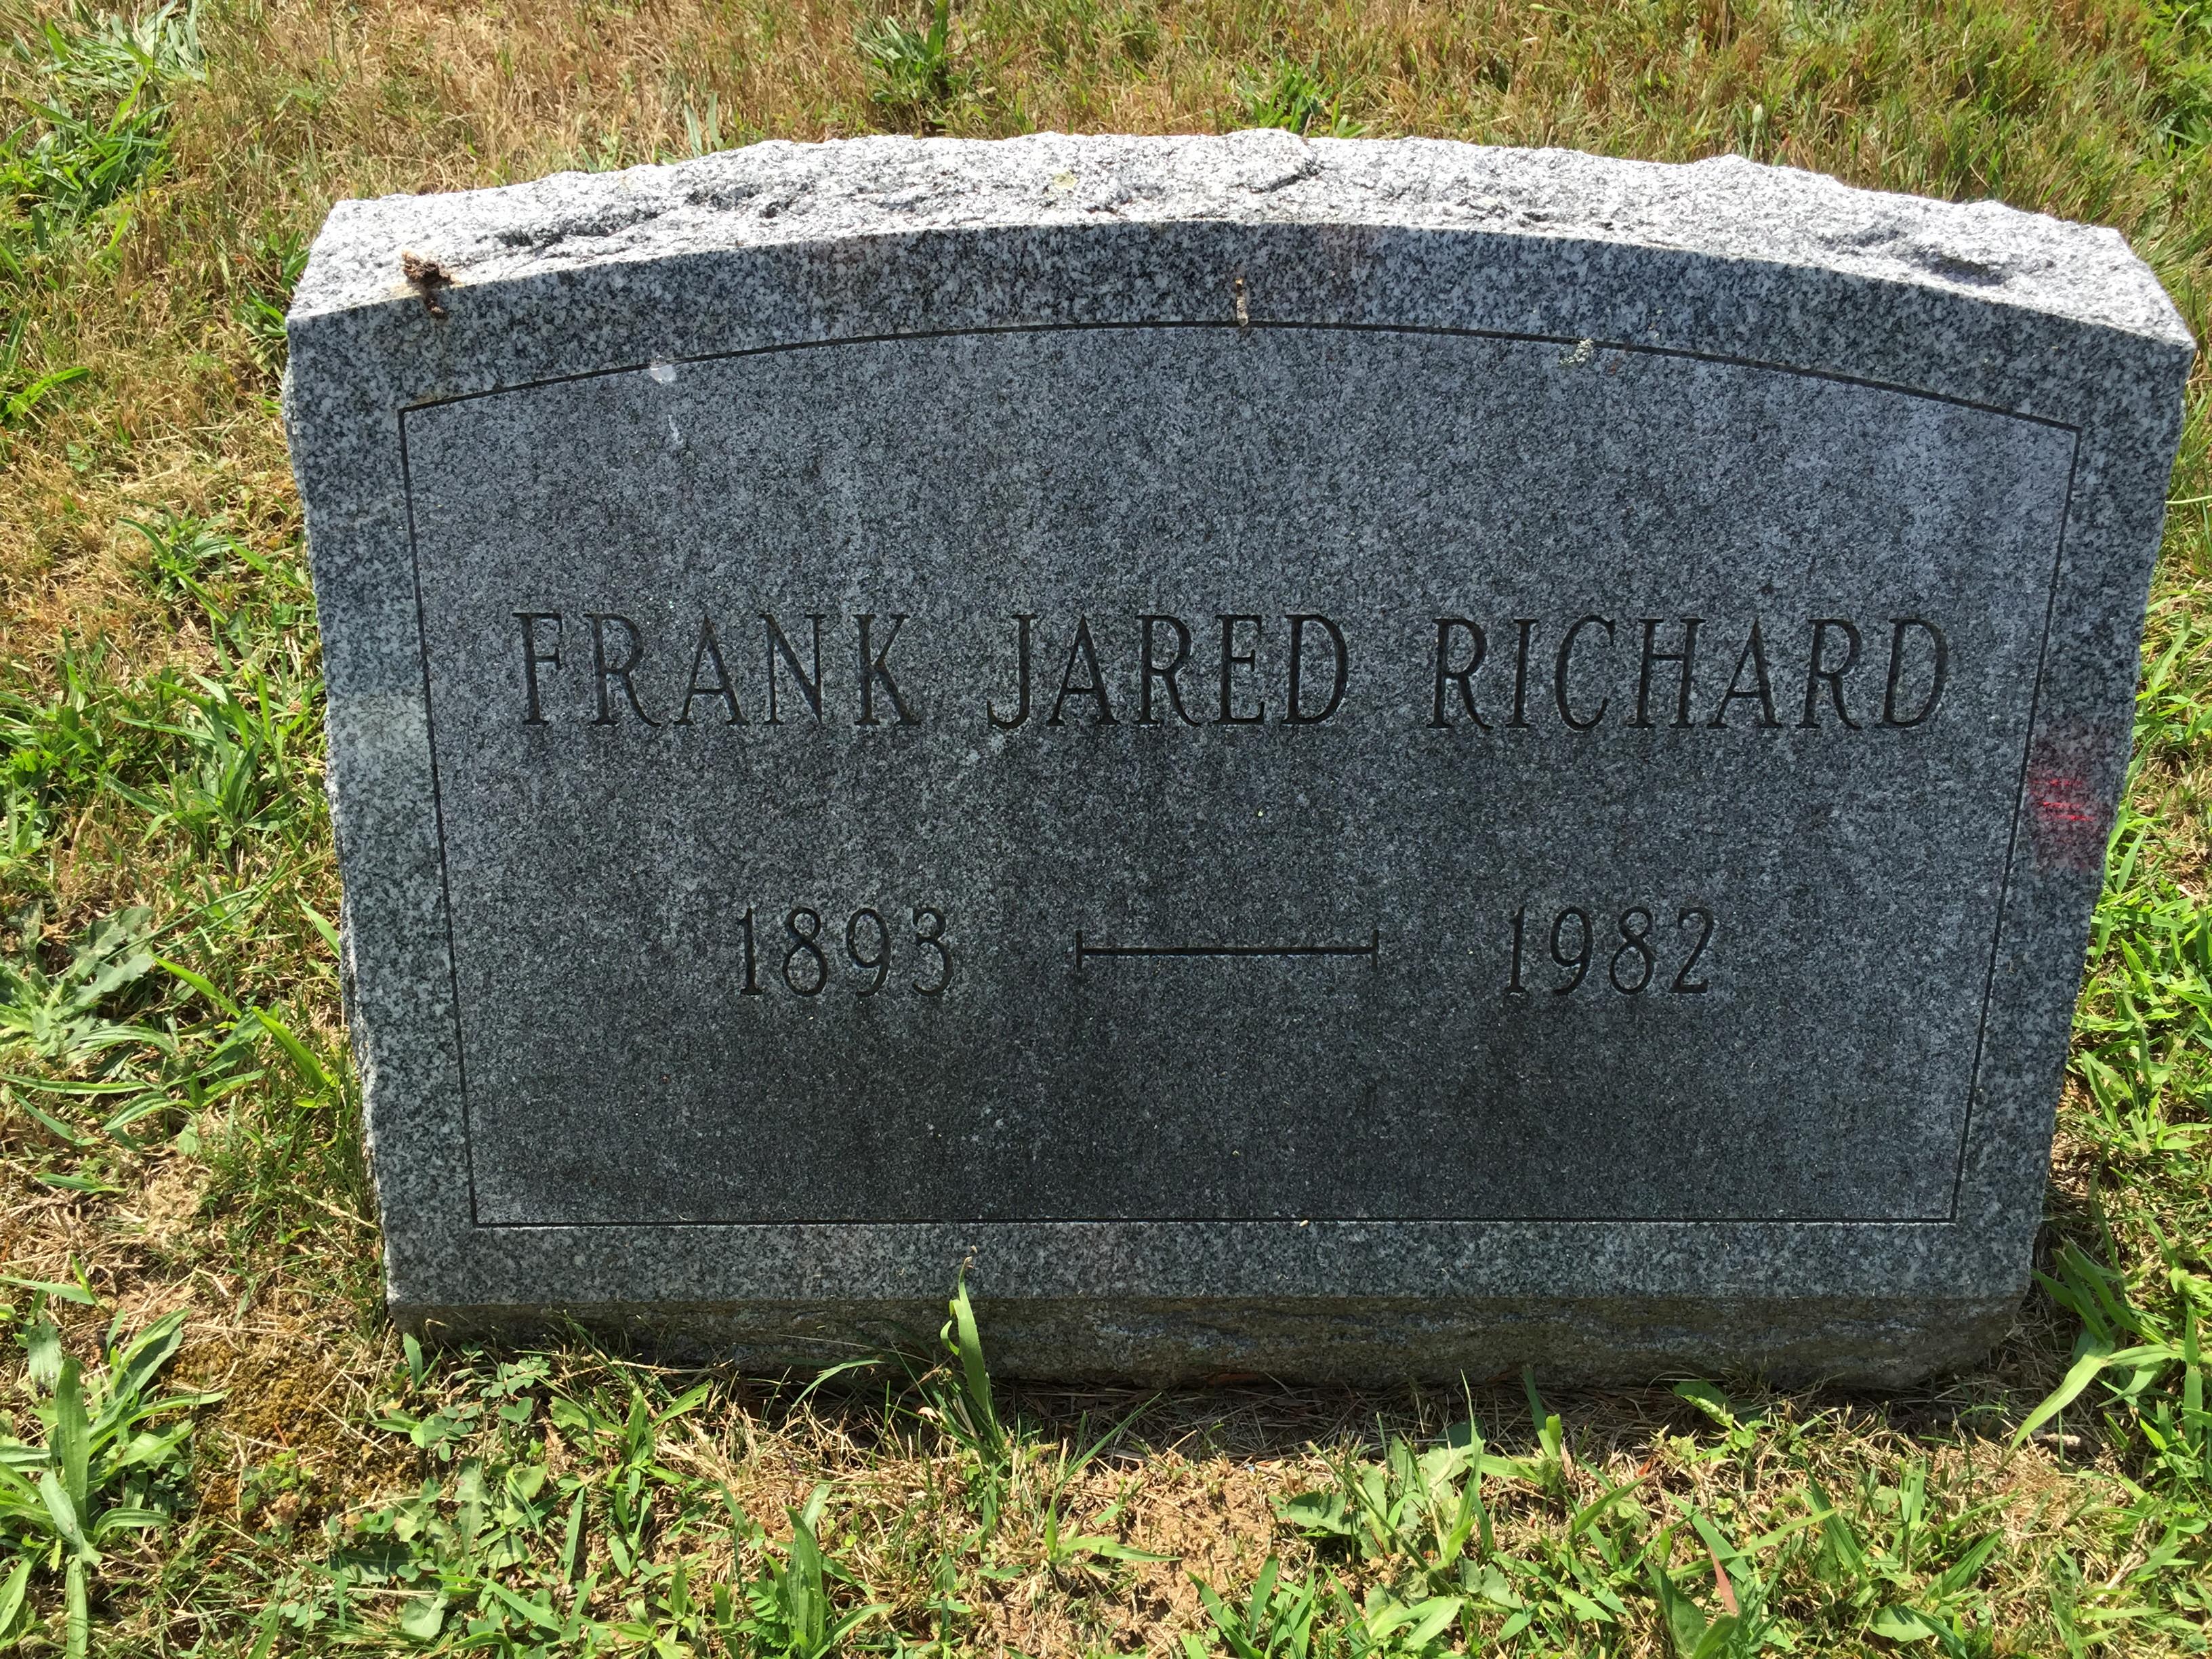 Frank Jared Richard